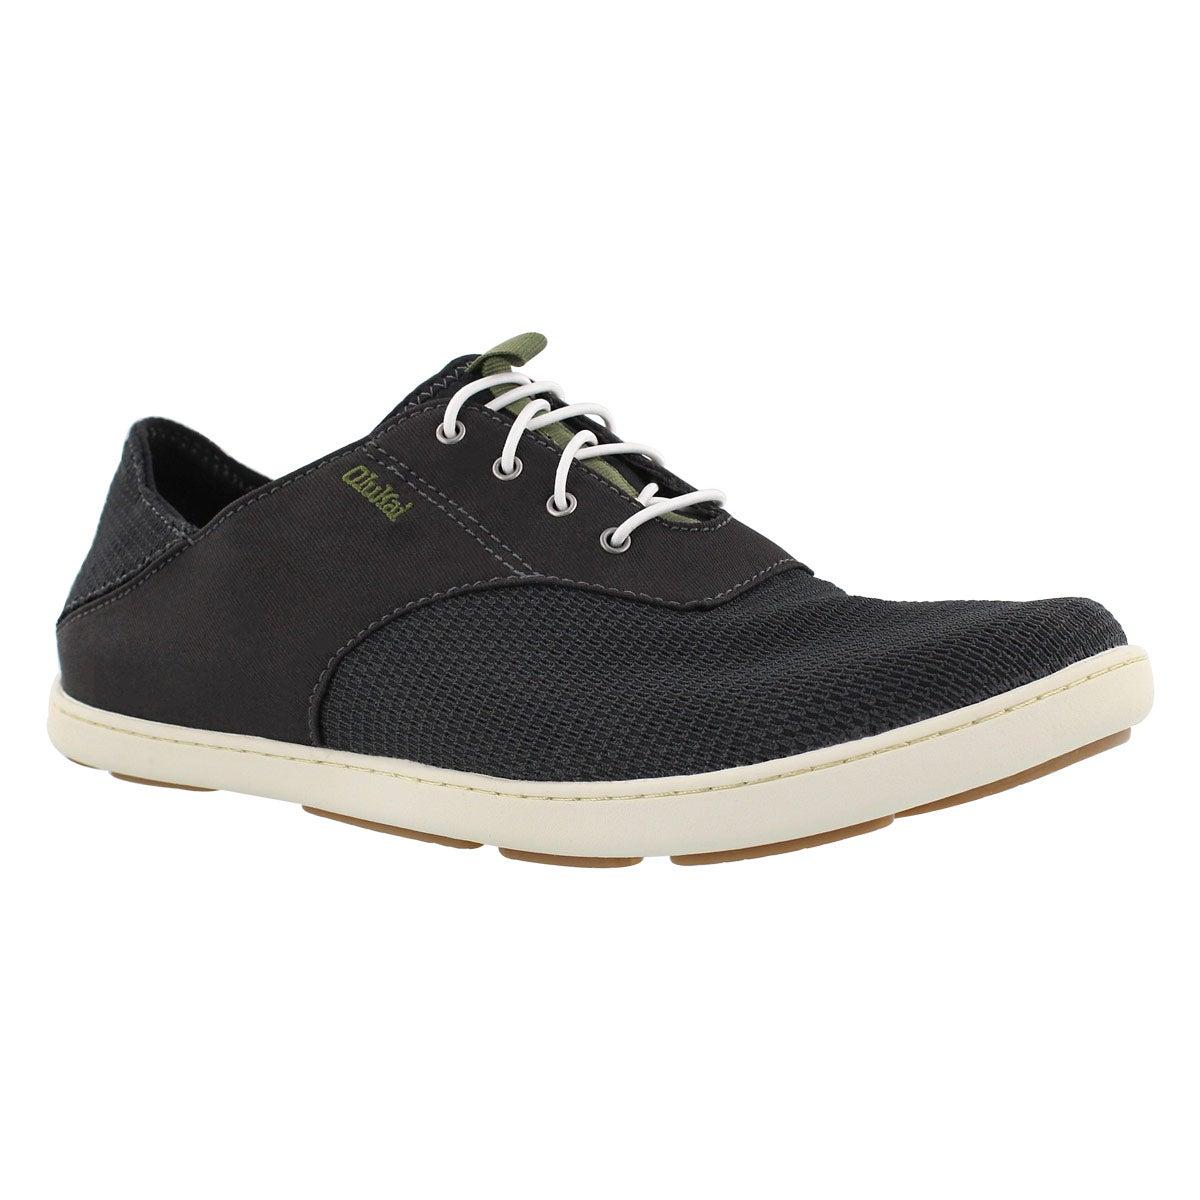 Men's NOHEA MOKU black/black sneakers